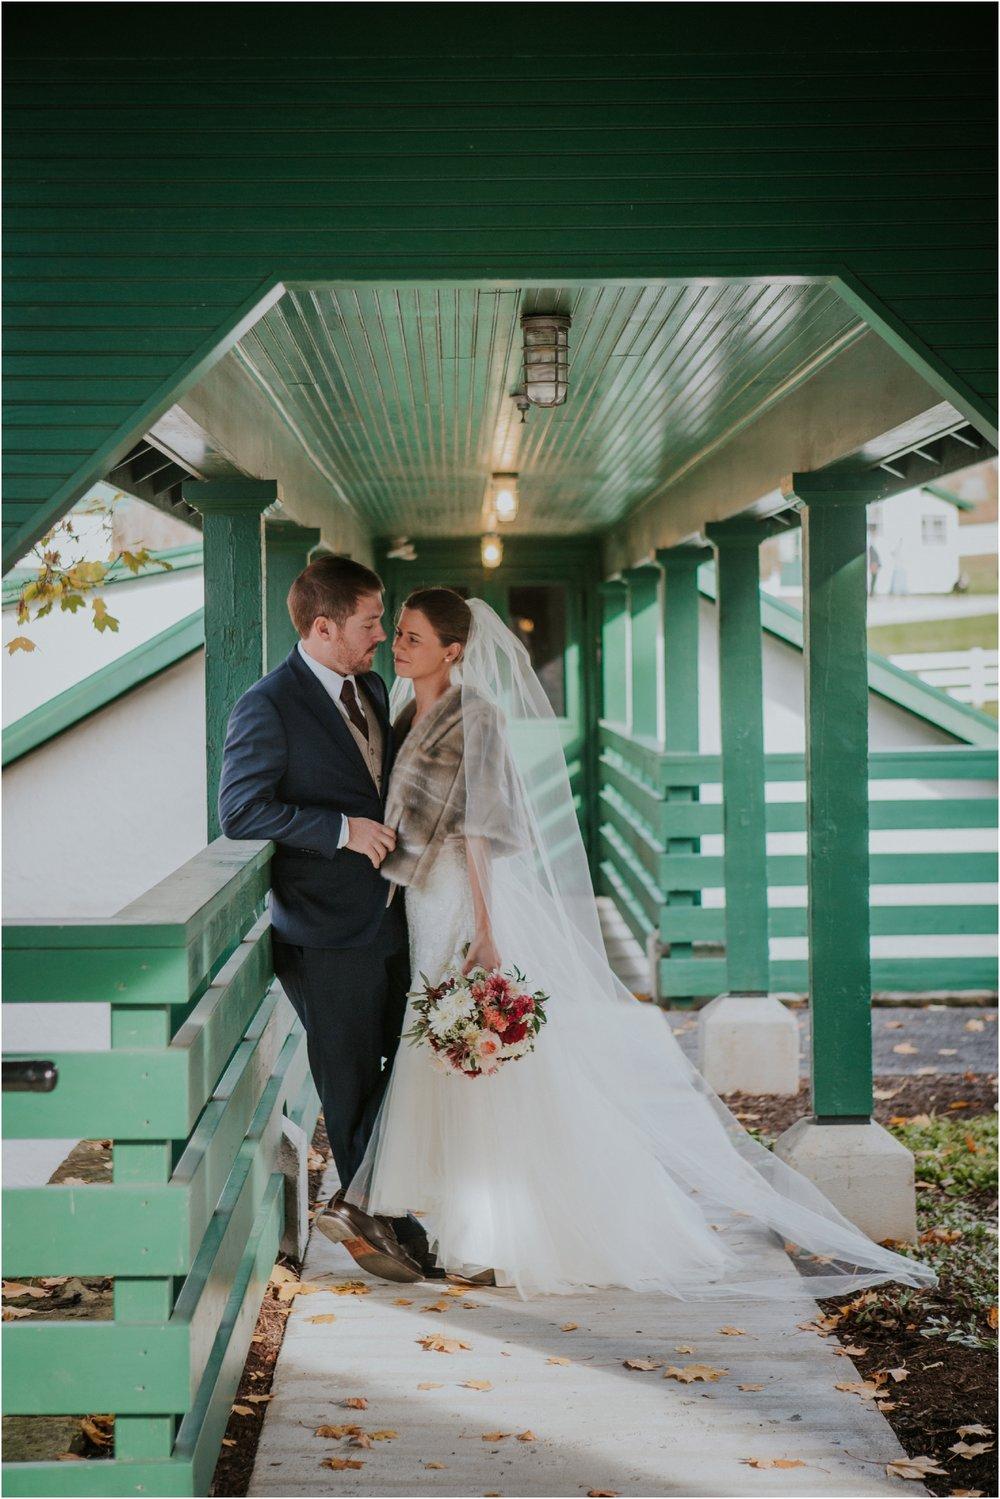 warm-springs-old-dairy-virginia-rustic-wedding-northeast-tennessee-elopement-adventuruous-photographer-katy-sergent_0034.jpg